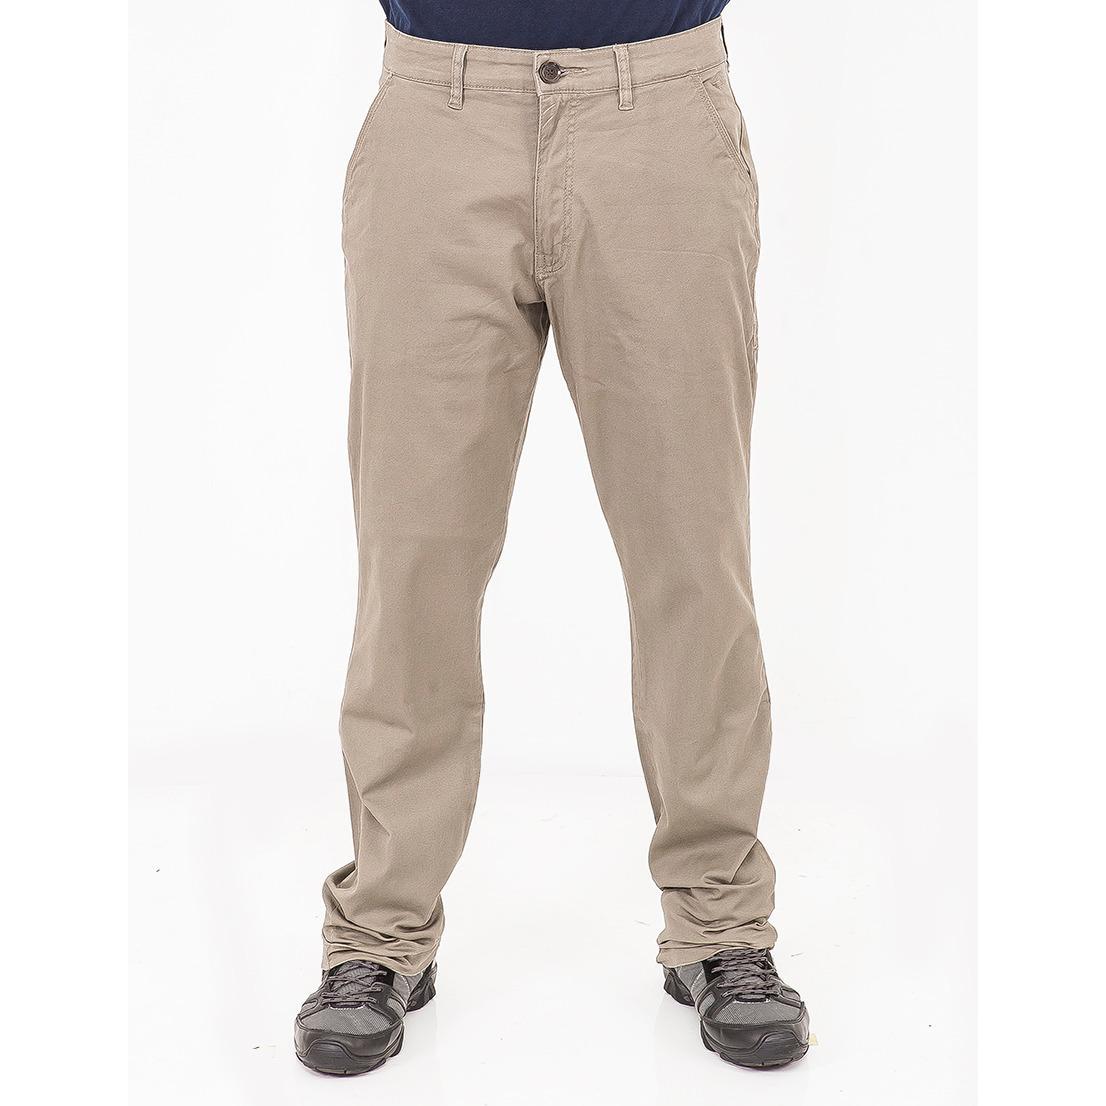 Buy Sell Cheapest Felix Celana Panjang Best Quality Product Deals Jogger Training Pria Dewasa Big Size Polos Jumbo Mgee C009